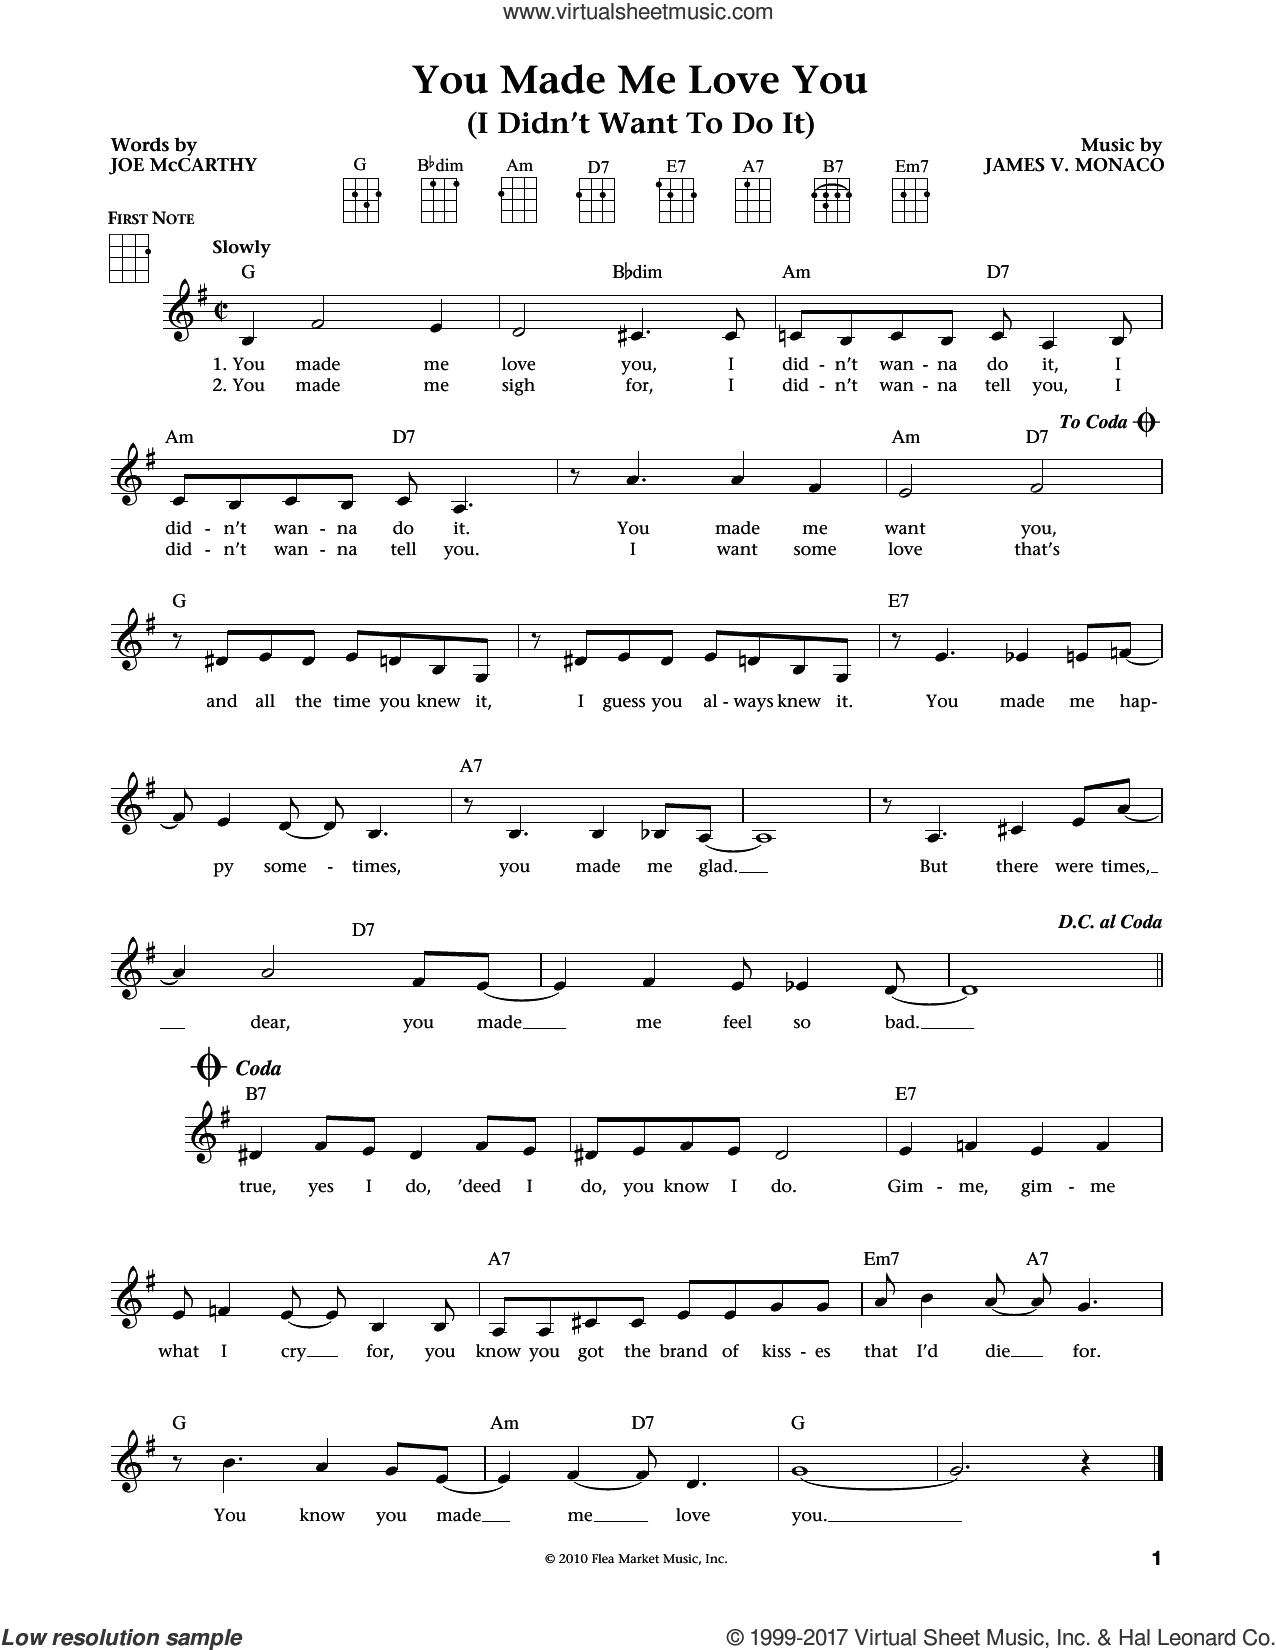 You Made Me Love You (I Didn't Want To Do It) (from The Daily Ukulele) (arr. Liz and Jim Beloff) sheet music for ukulele by James Monaco, Jim Beloff, Liz Beloff and Joe McCarthy, intermediate skill level